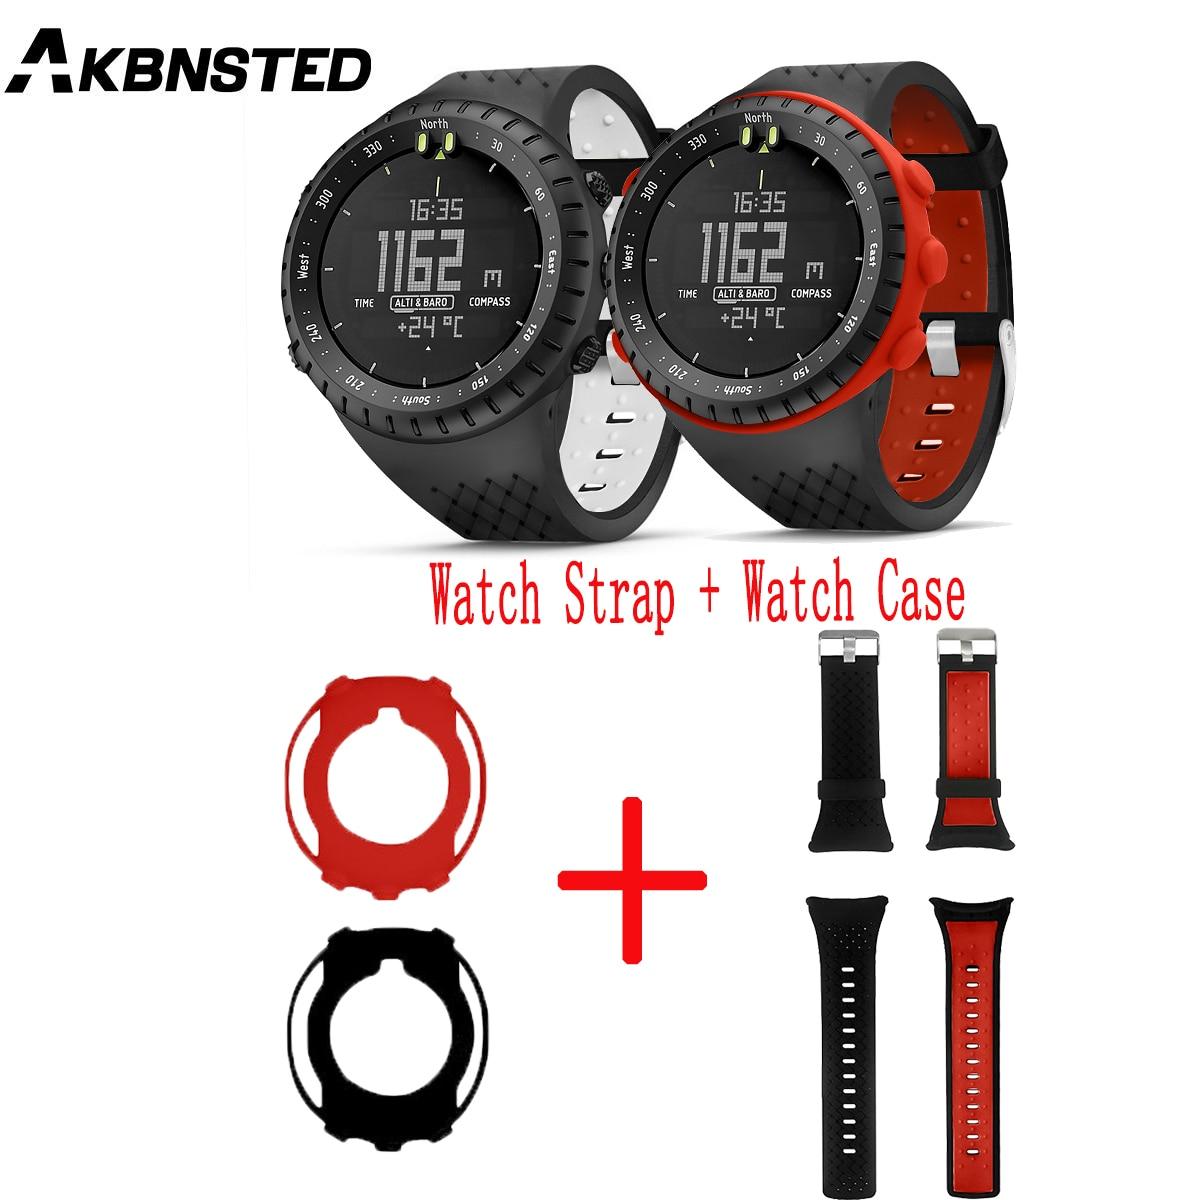 Akbnsted fot suunto núcleo relógio inteligente 2 in1 colorido silicone pulseira de relógio + silicone macio caso protetor substituir acessórios